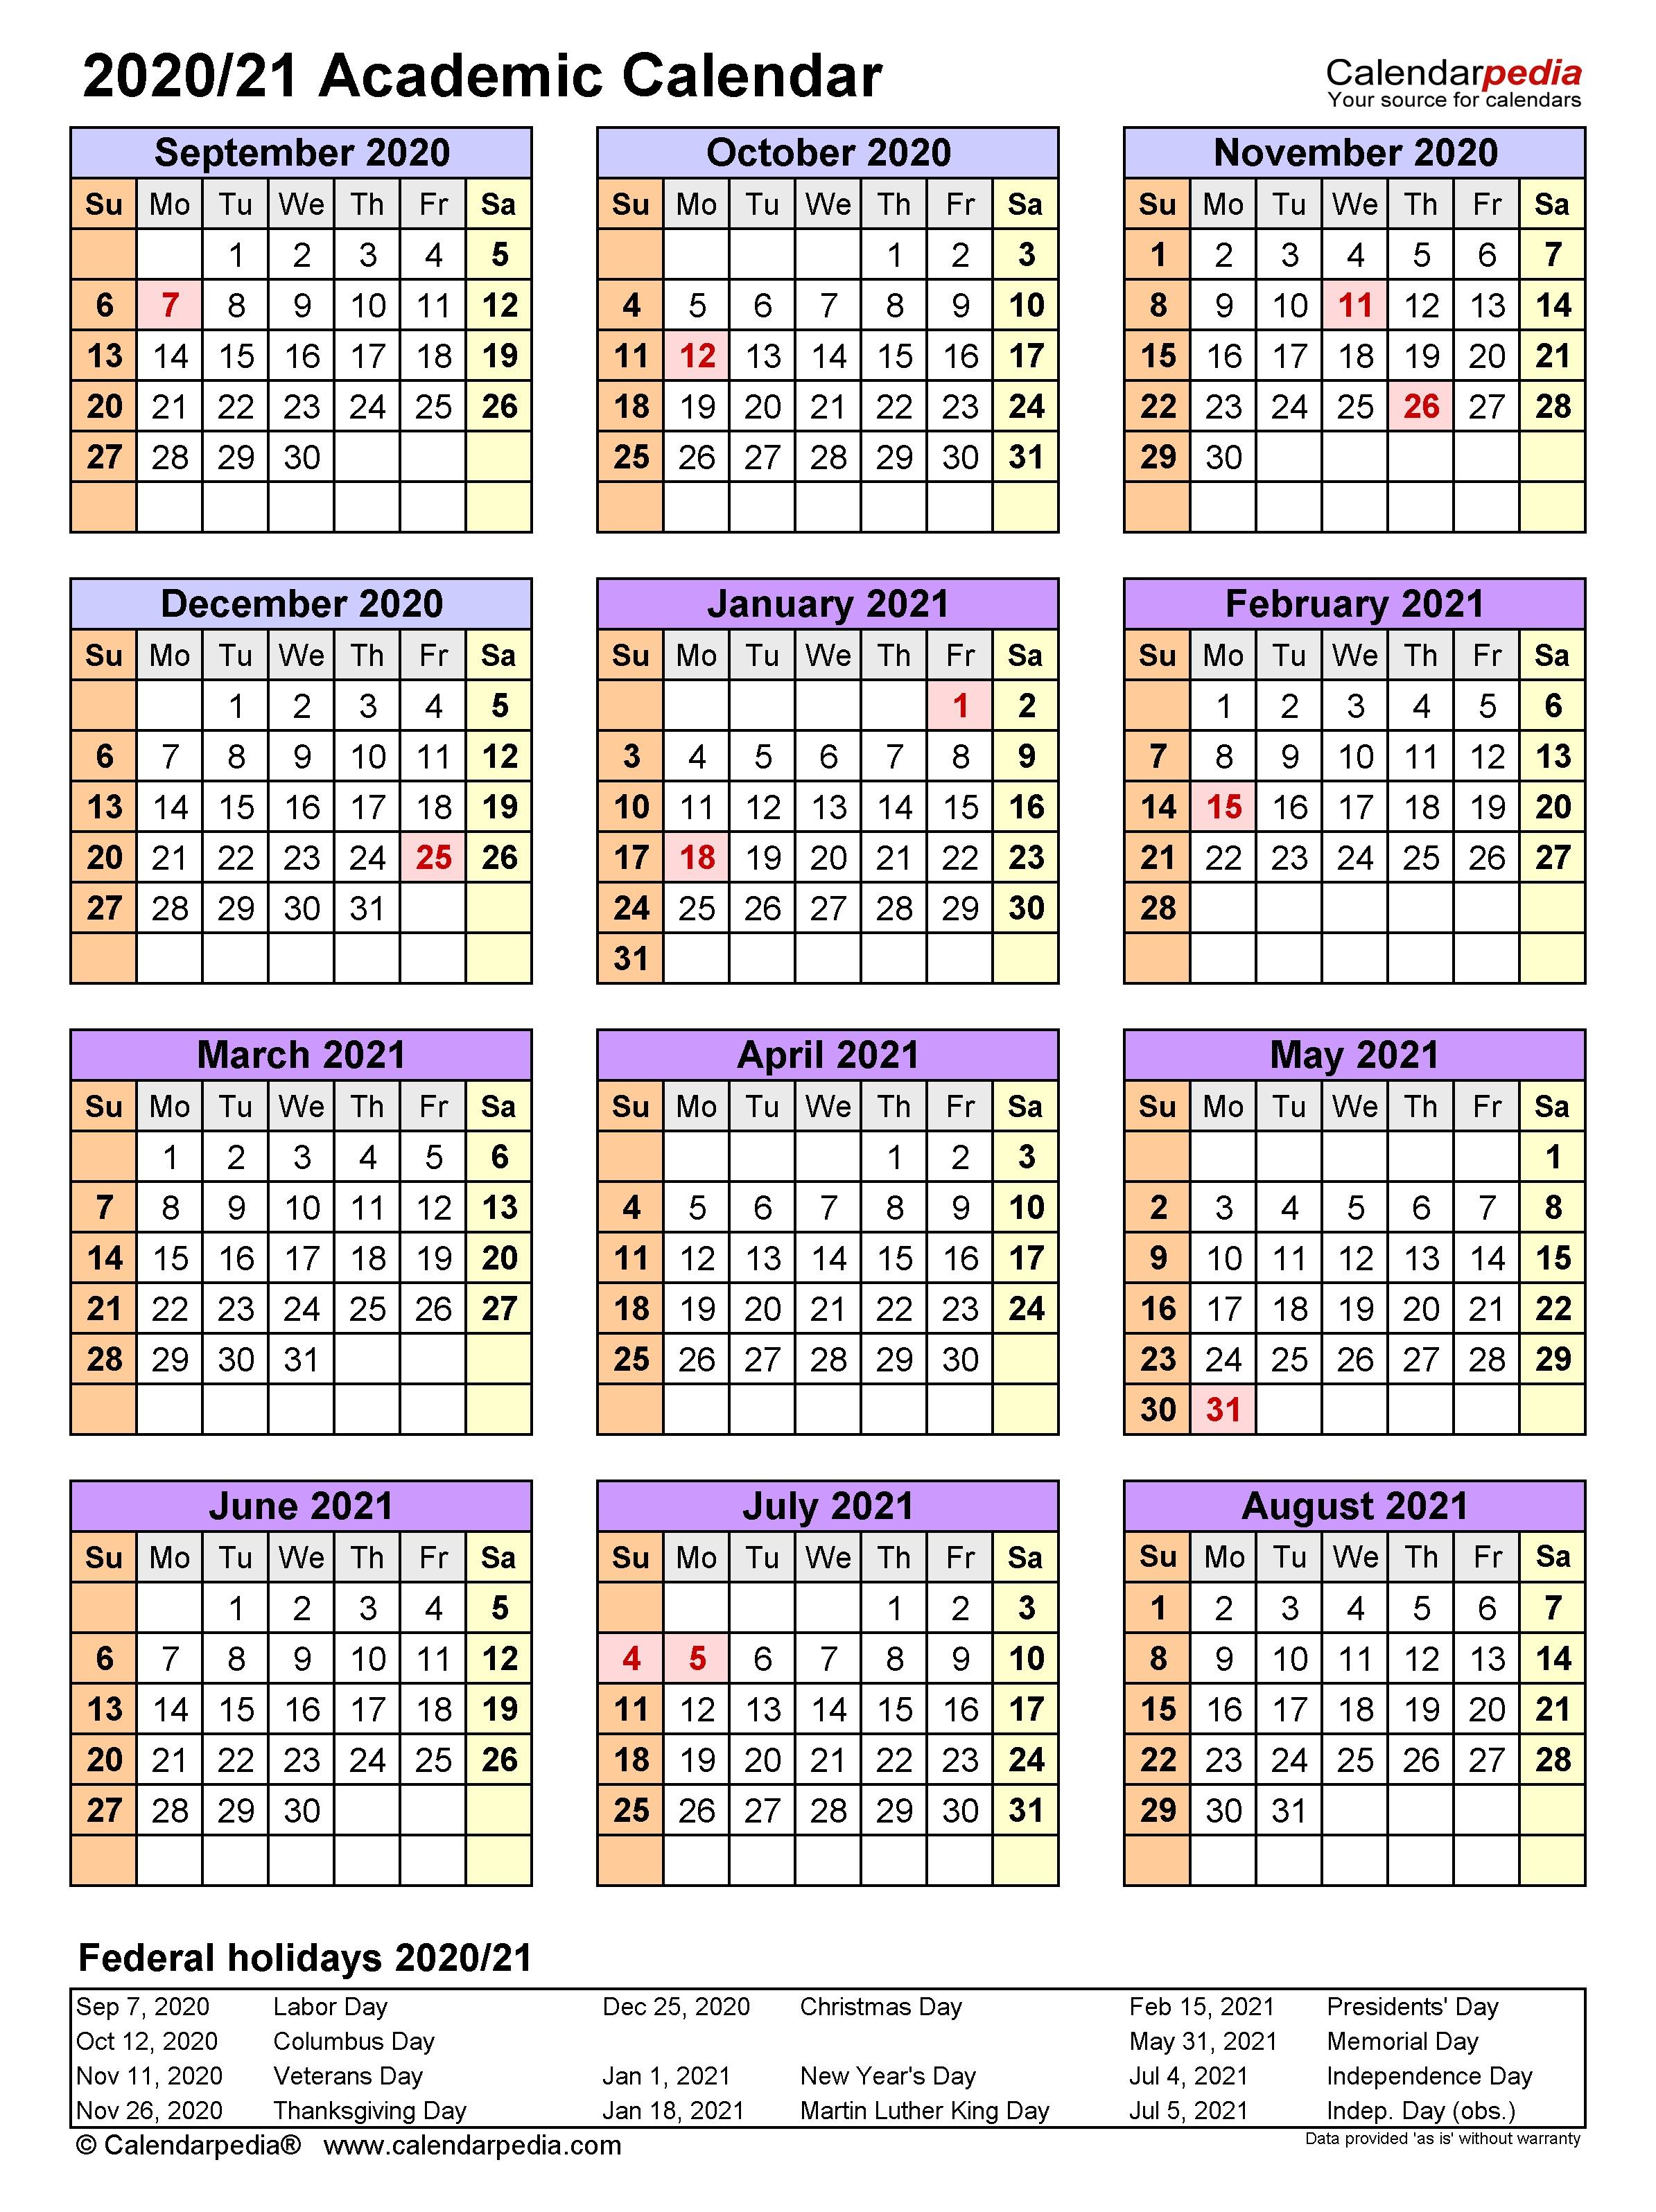 002 Remarkable School Year Calendar Template High Resolution  Excel 2019-20 WordFull